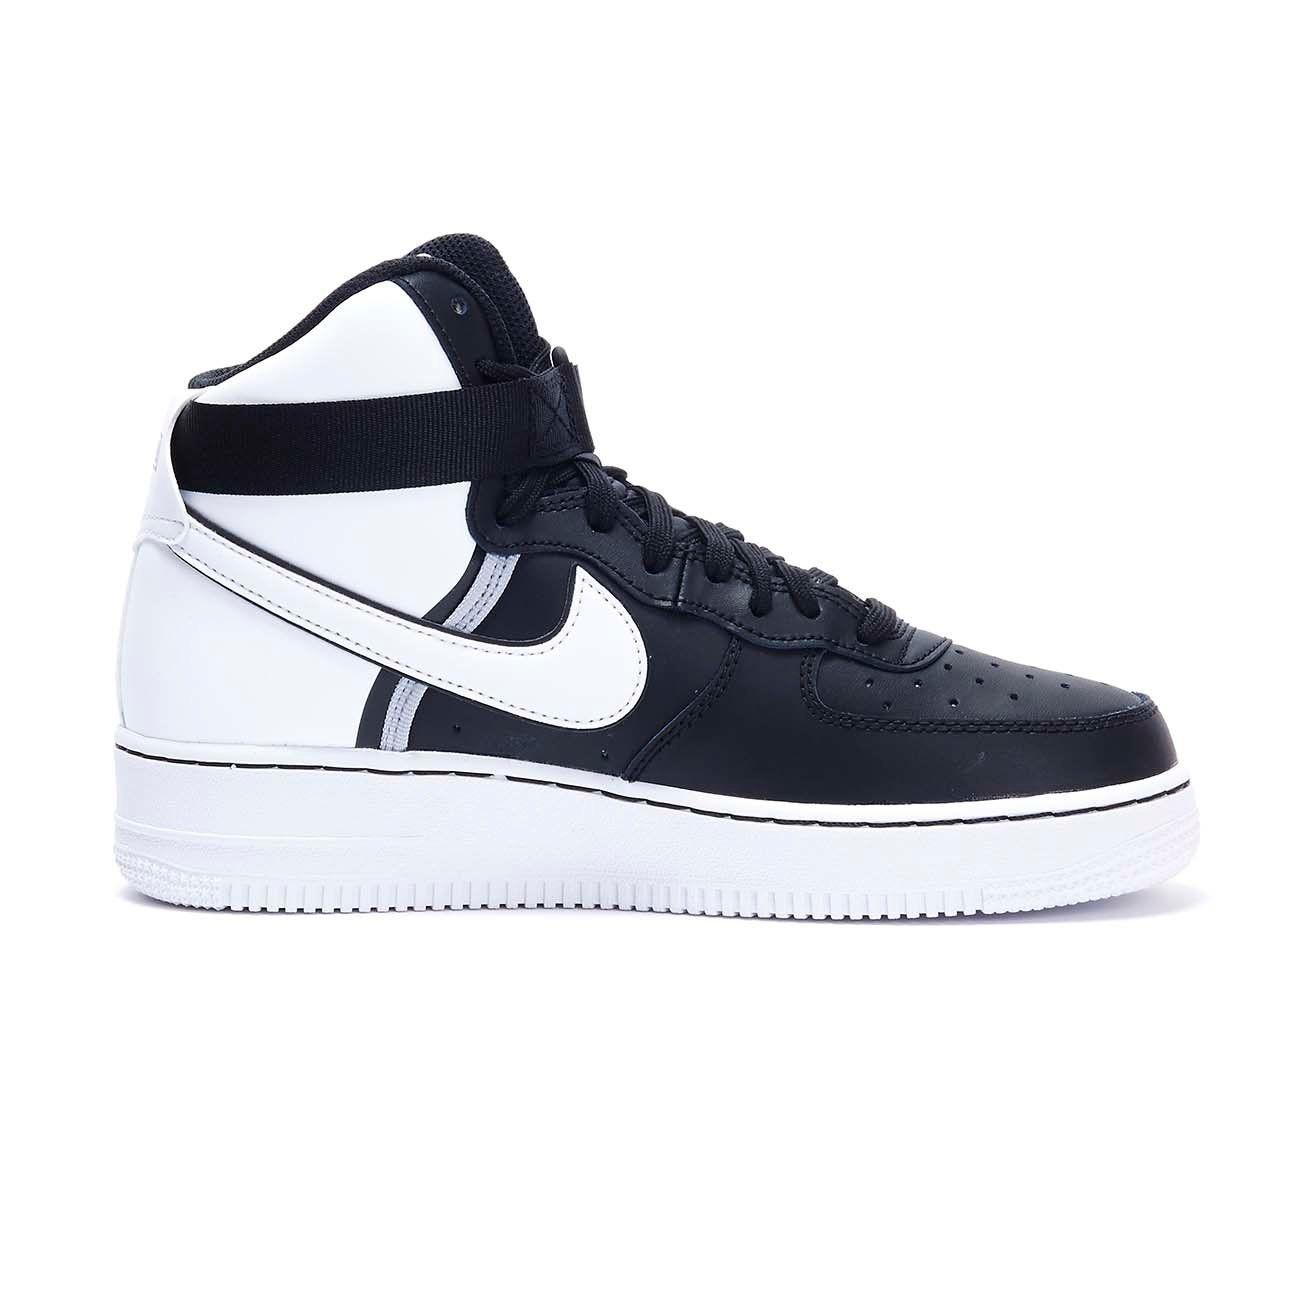 air force 1 sneakers nike bambini